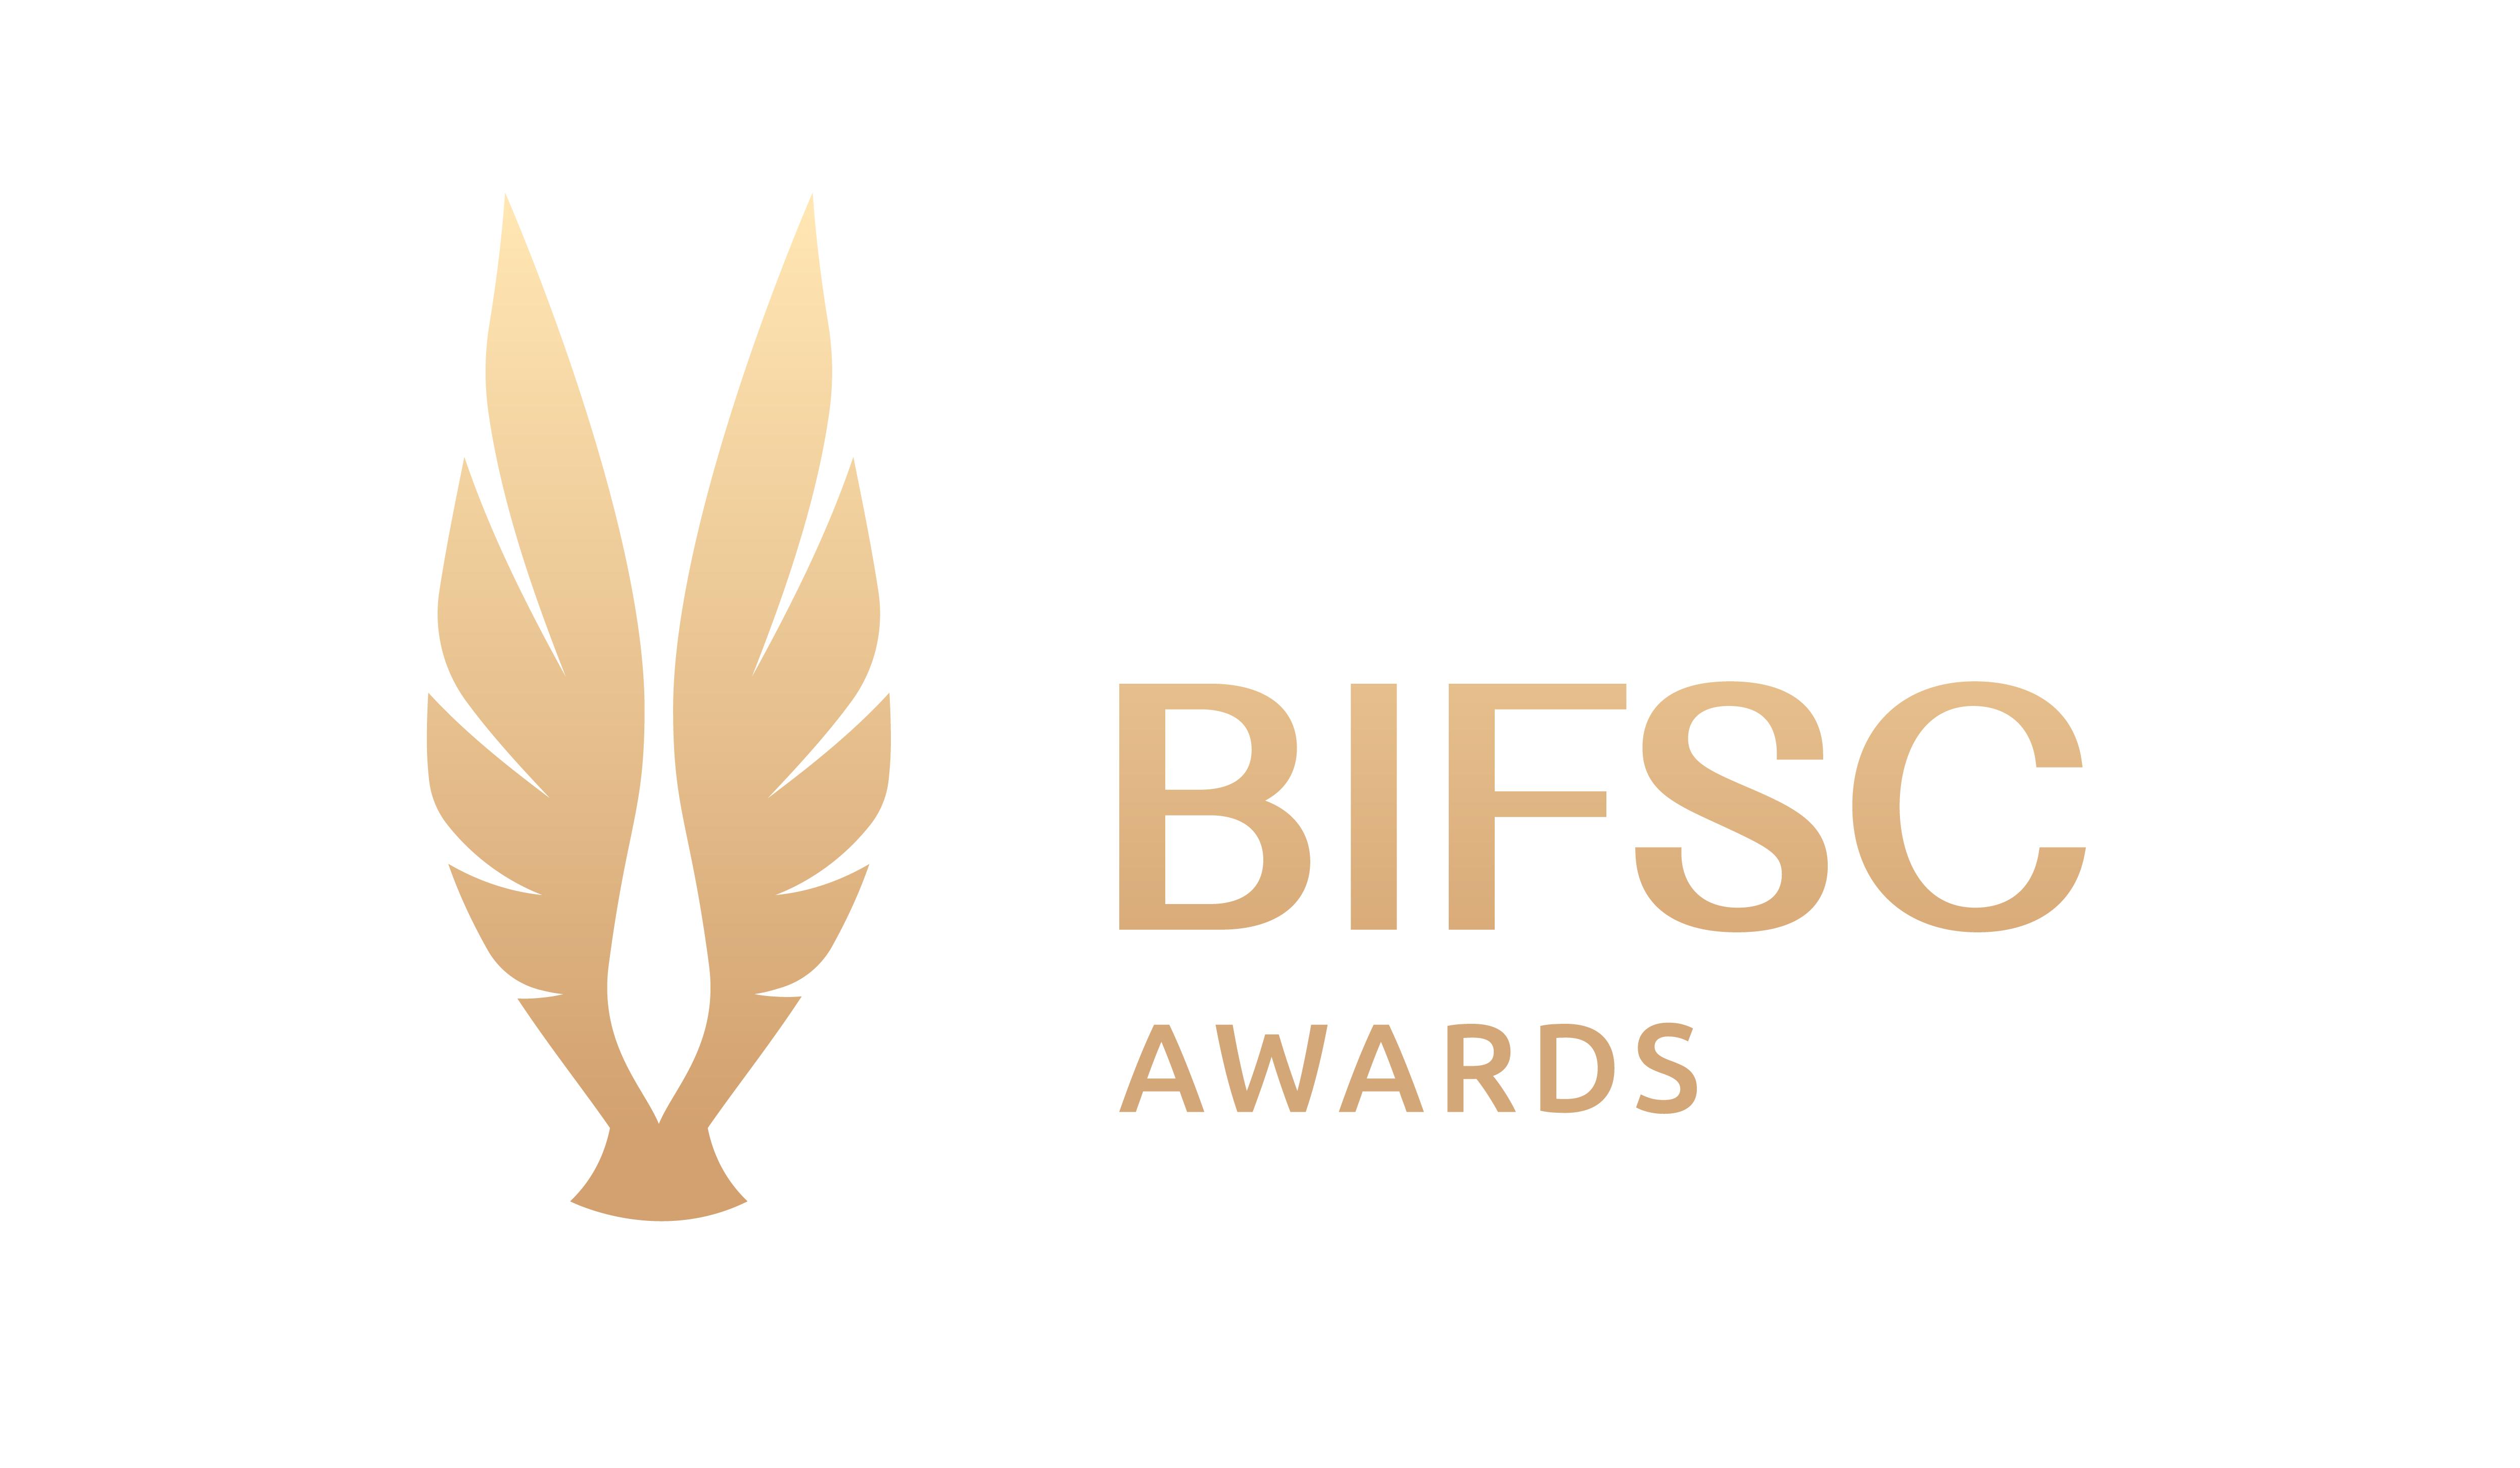 www.bifsc.org